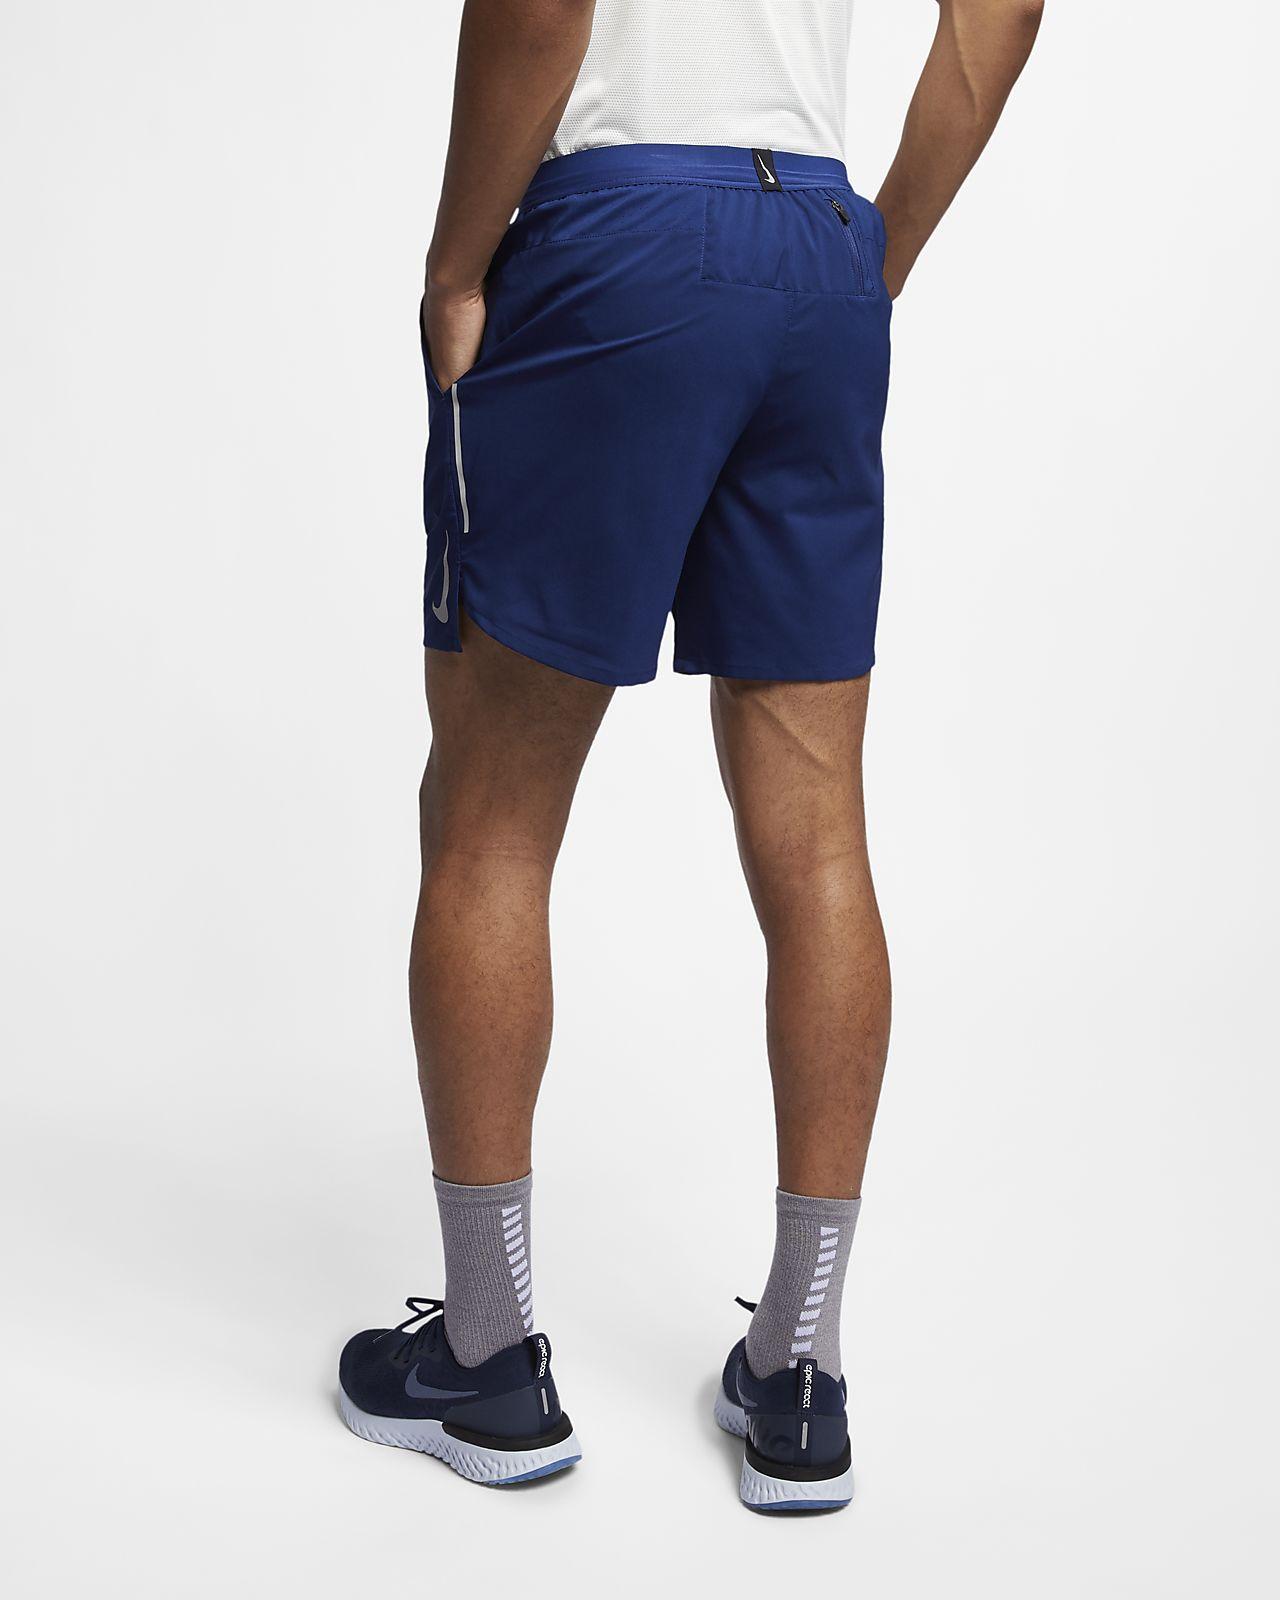 Nike Flex Stride Men's 18cm (approx.) Brief Lined Running Shorts